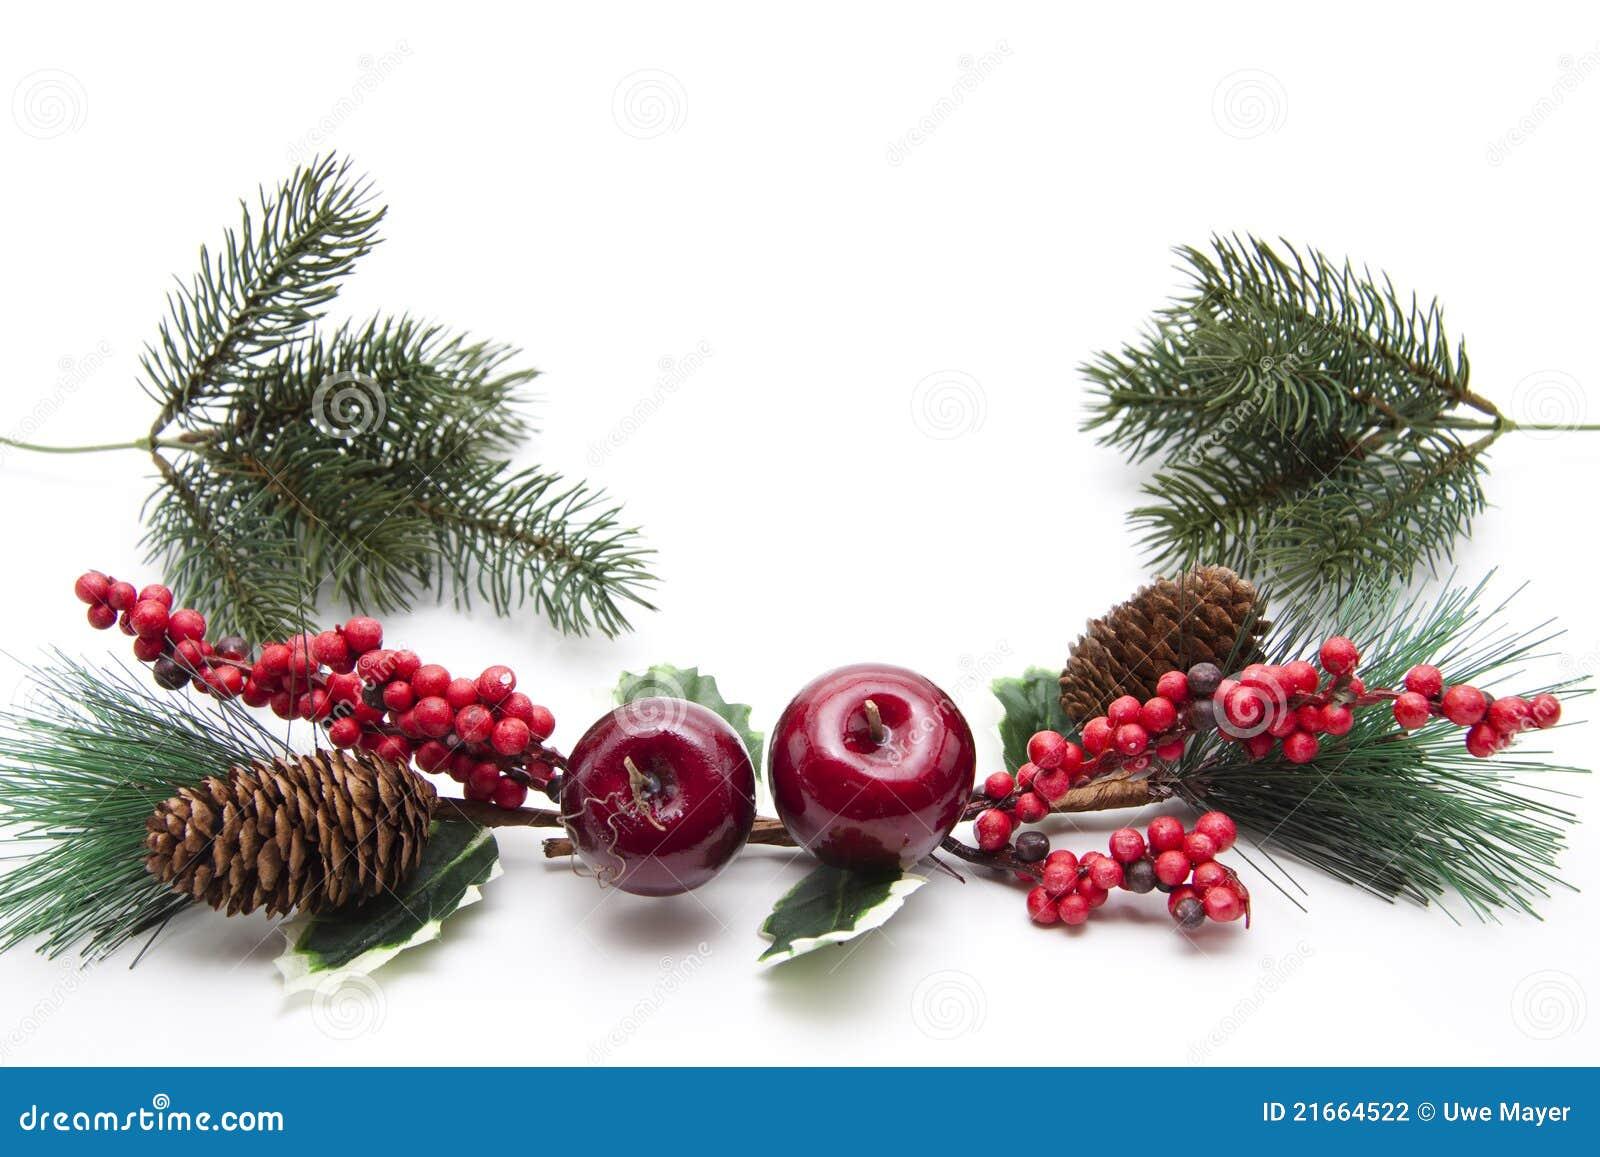 #AD1E33 Christmas Decoration Stock Photography Image: 21664522 6361 décoration noel commerce 1300x957 px @ aertt.com